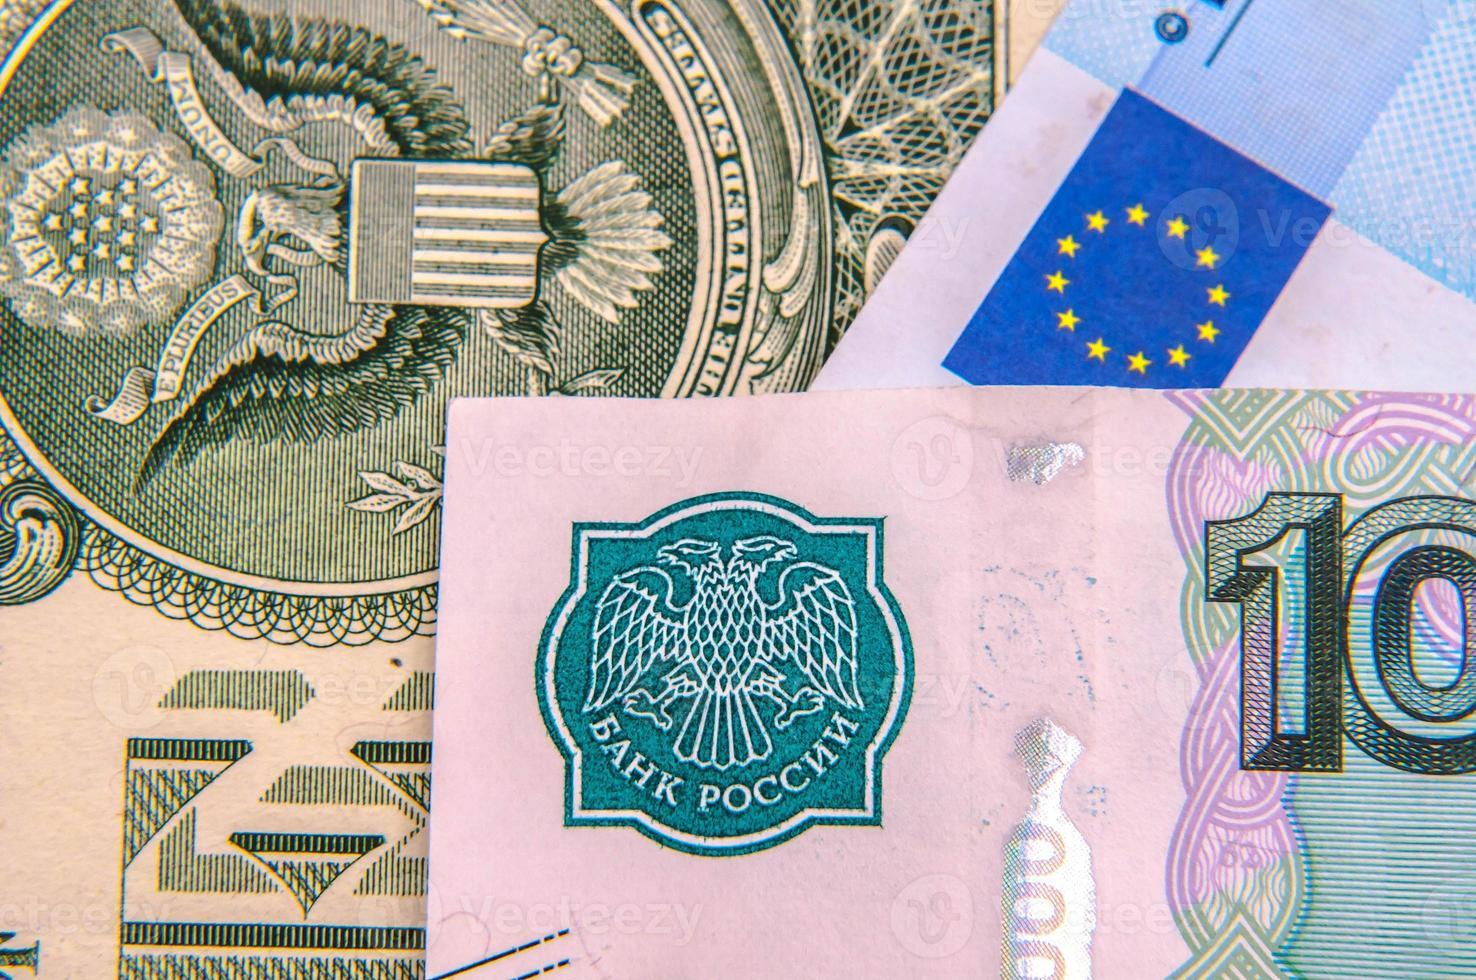 World money - Dollars, euros, russian roubles photo